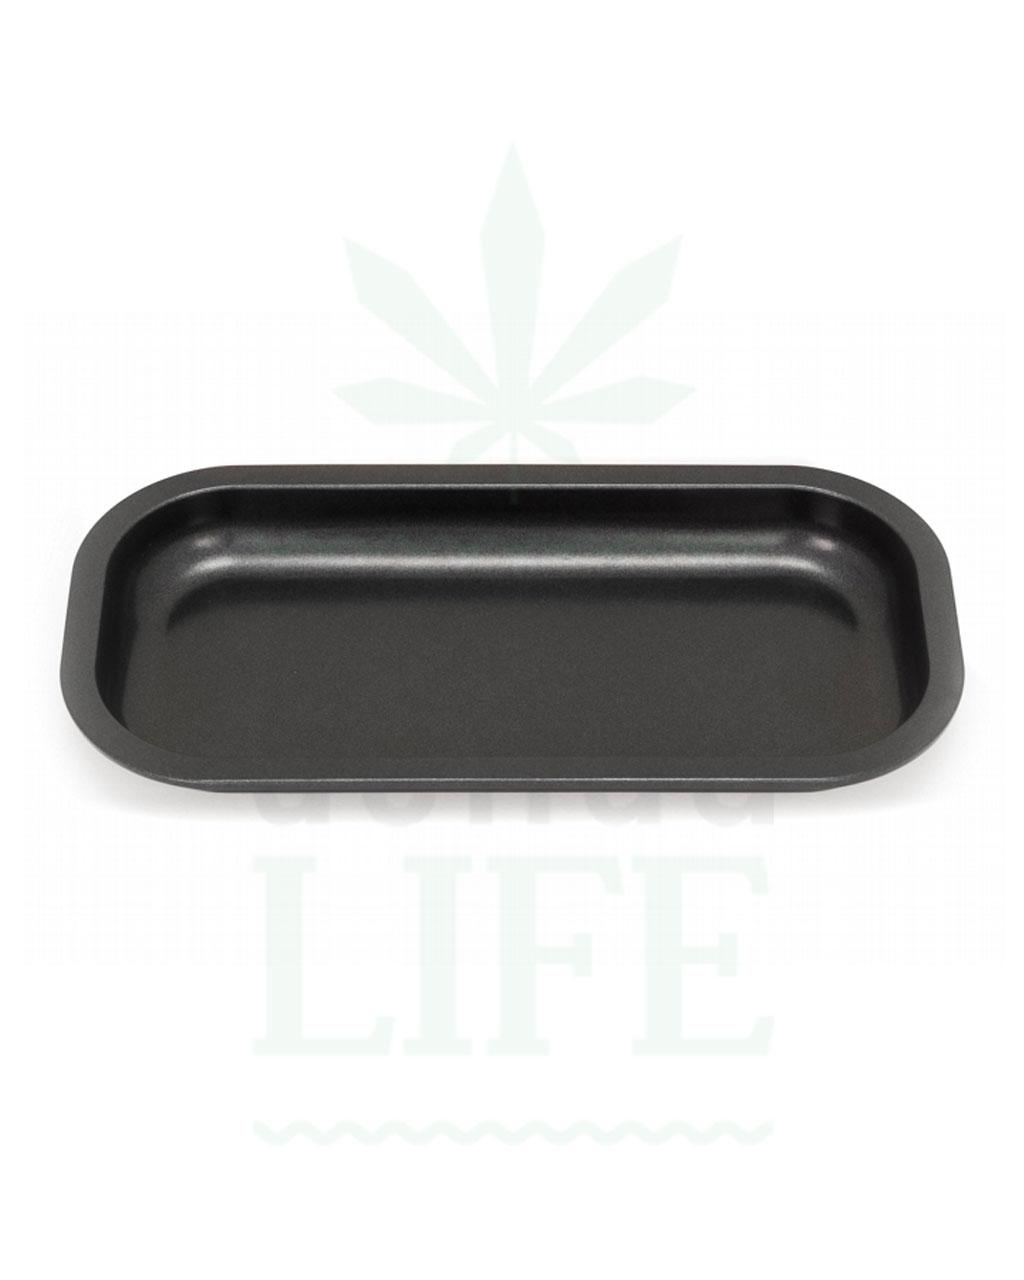 aus Metall SLX Keramikbeschichtetes Rolling Tray | S